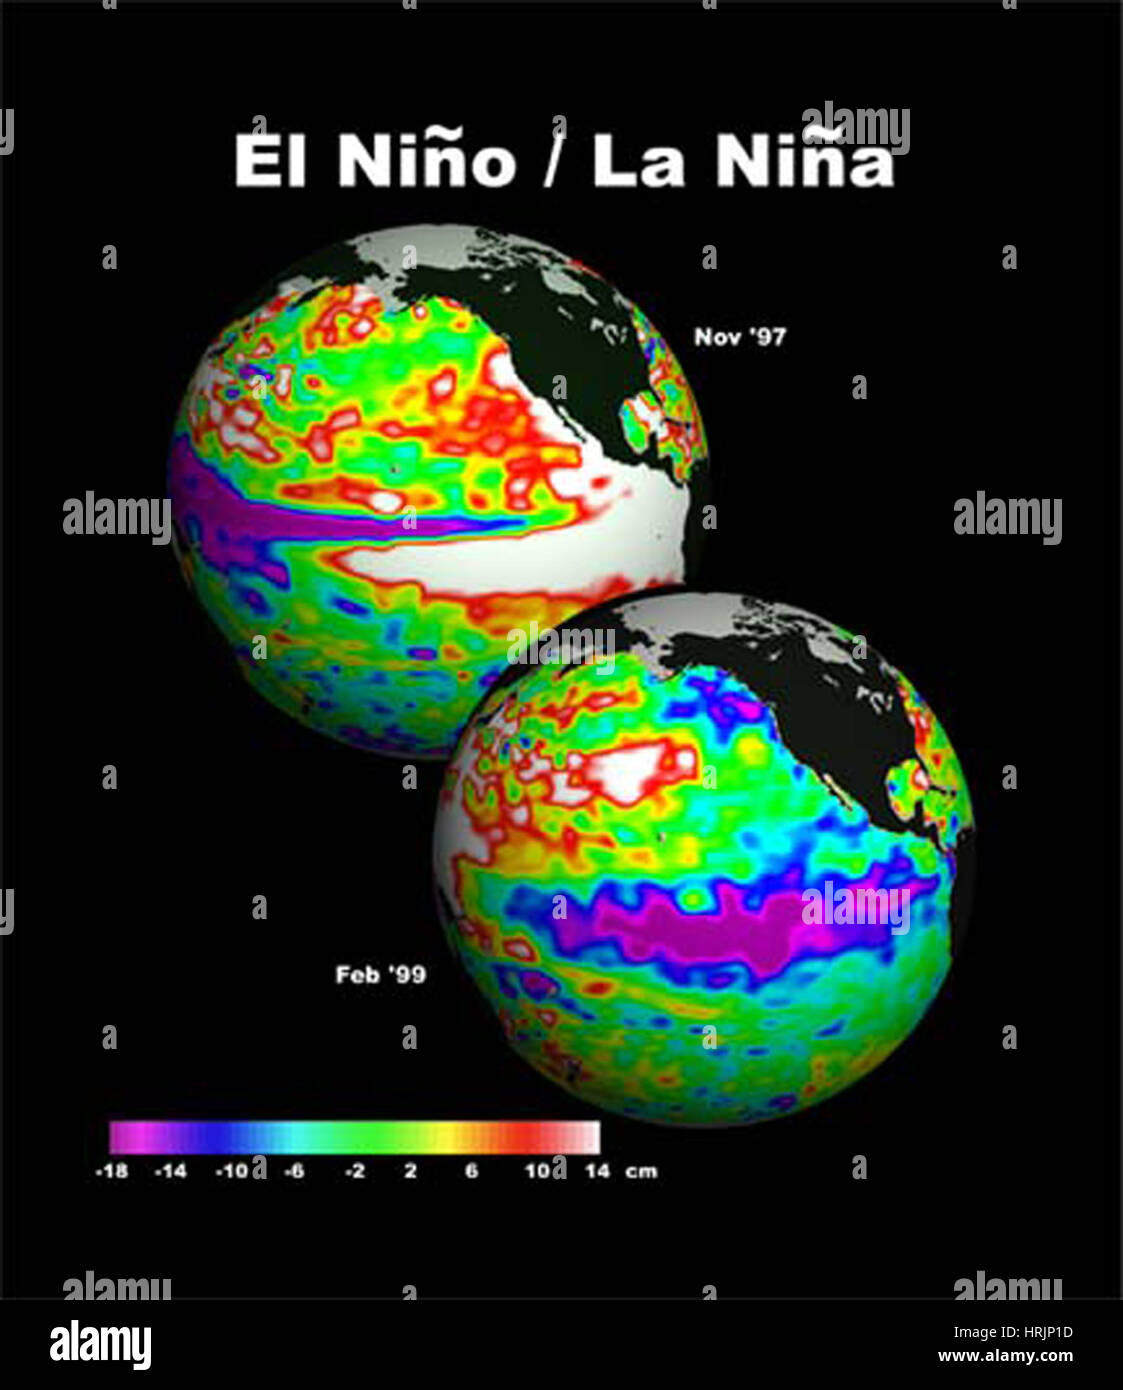 El Ni̱o - 1997, La Ni̱a - 1999 Imagen De Stock